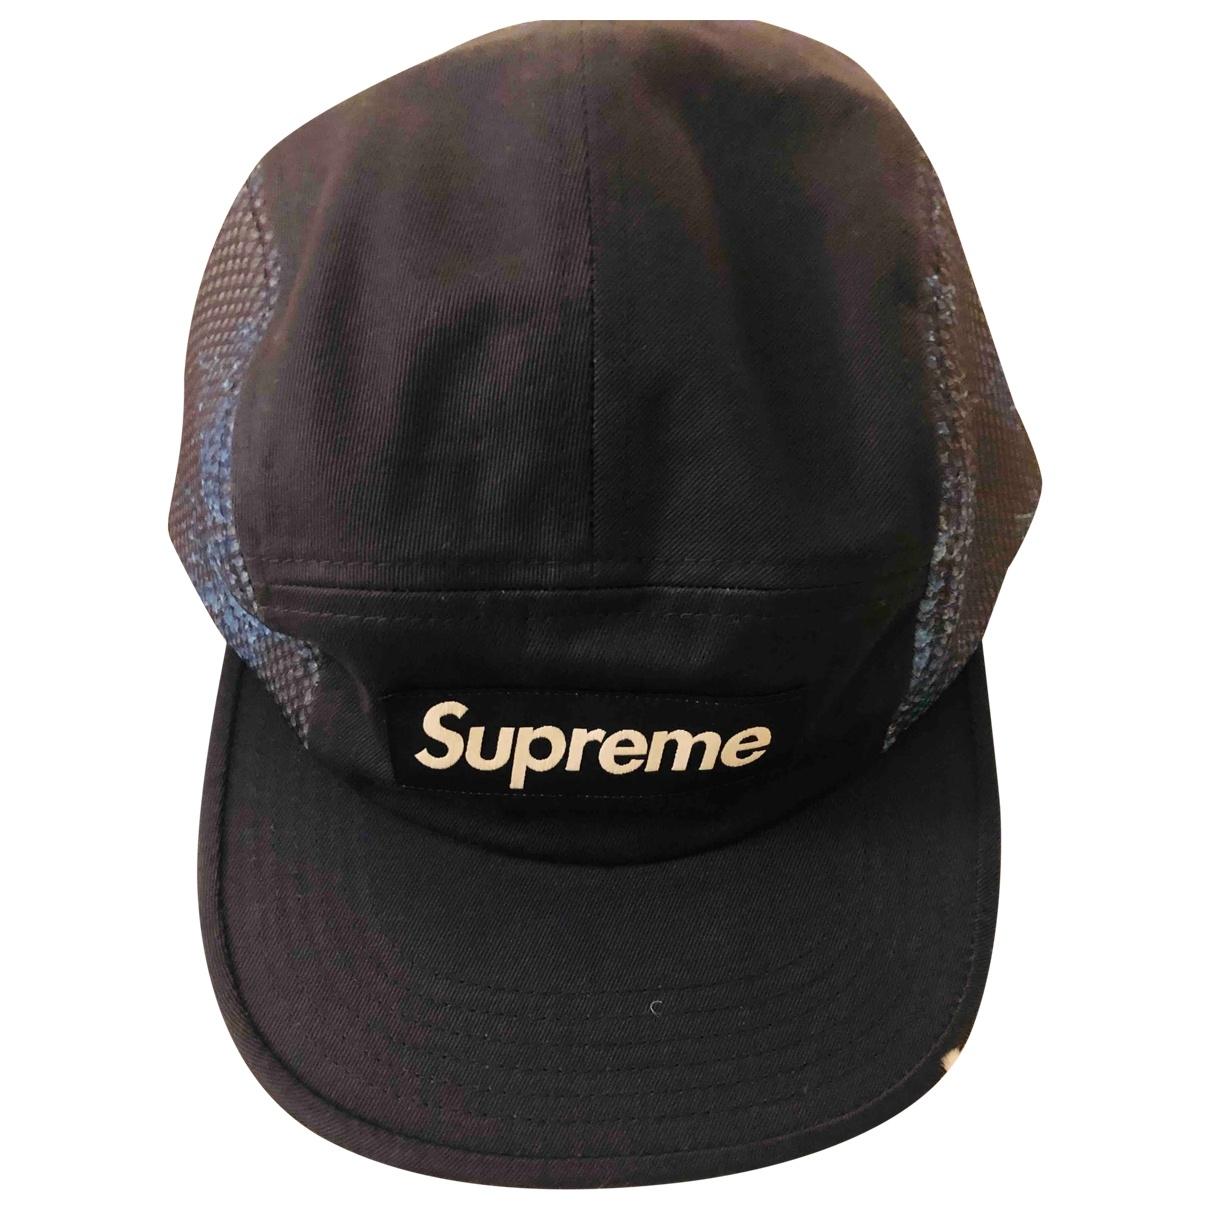 Sombrero / gorro de Lona Supreme